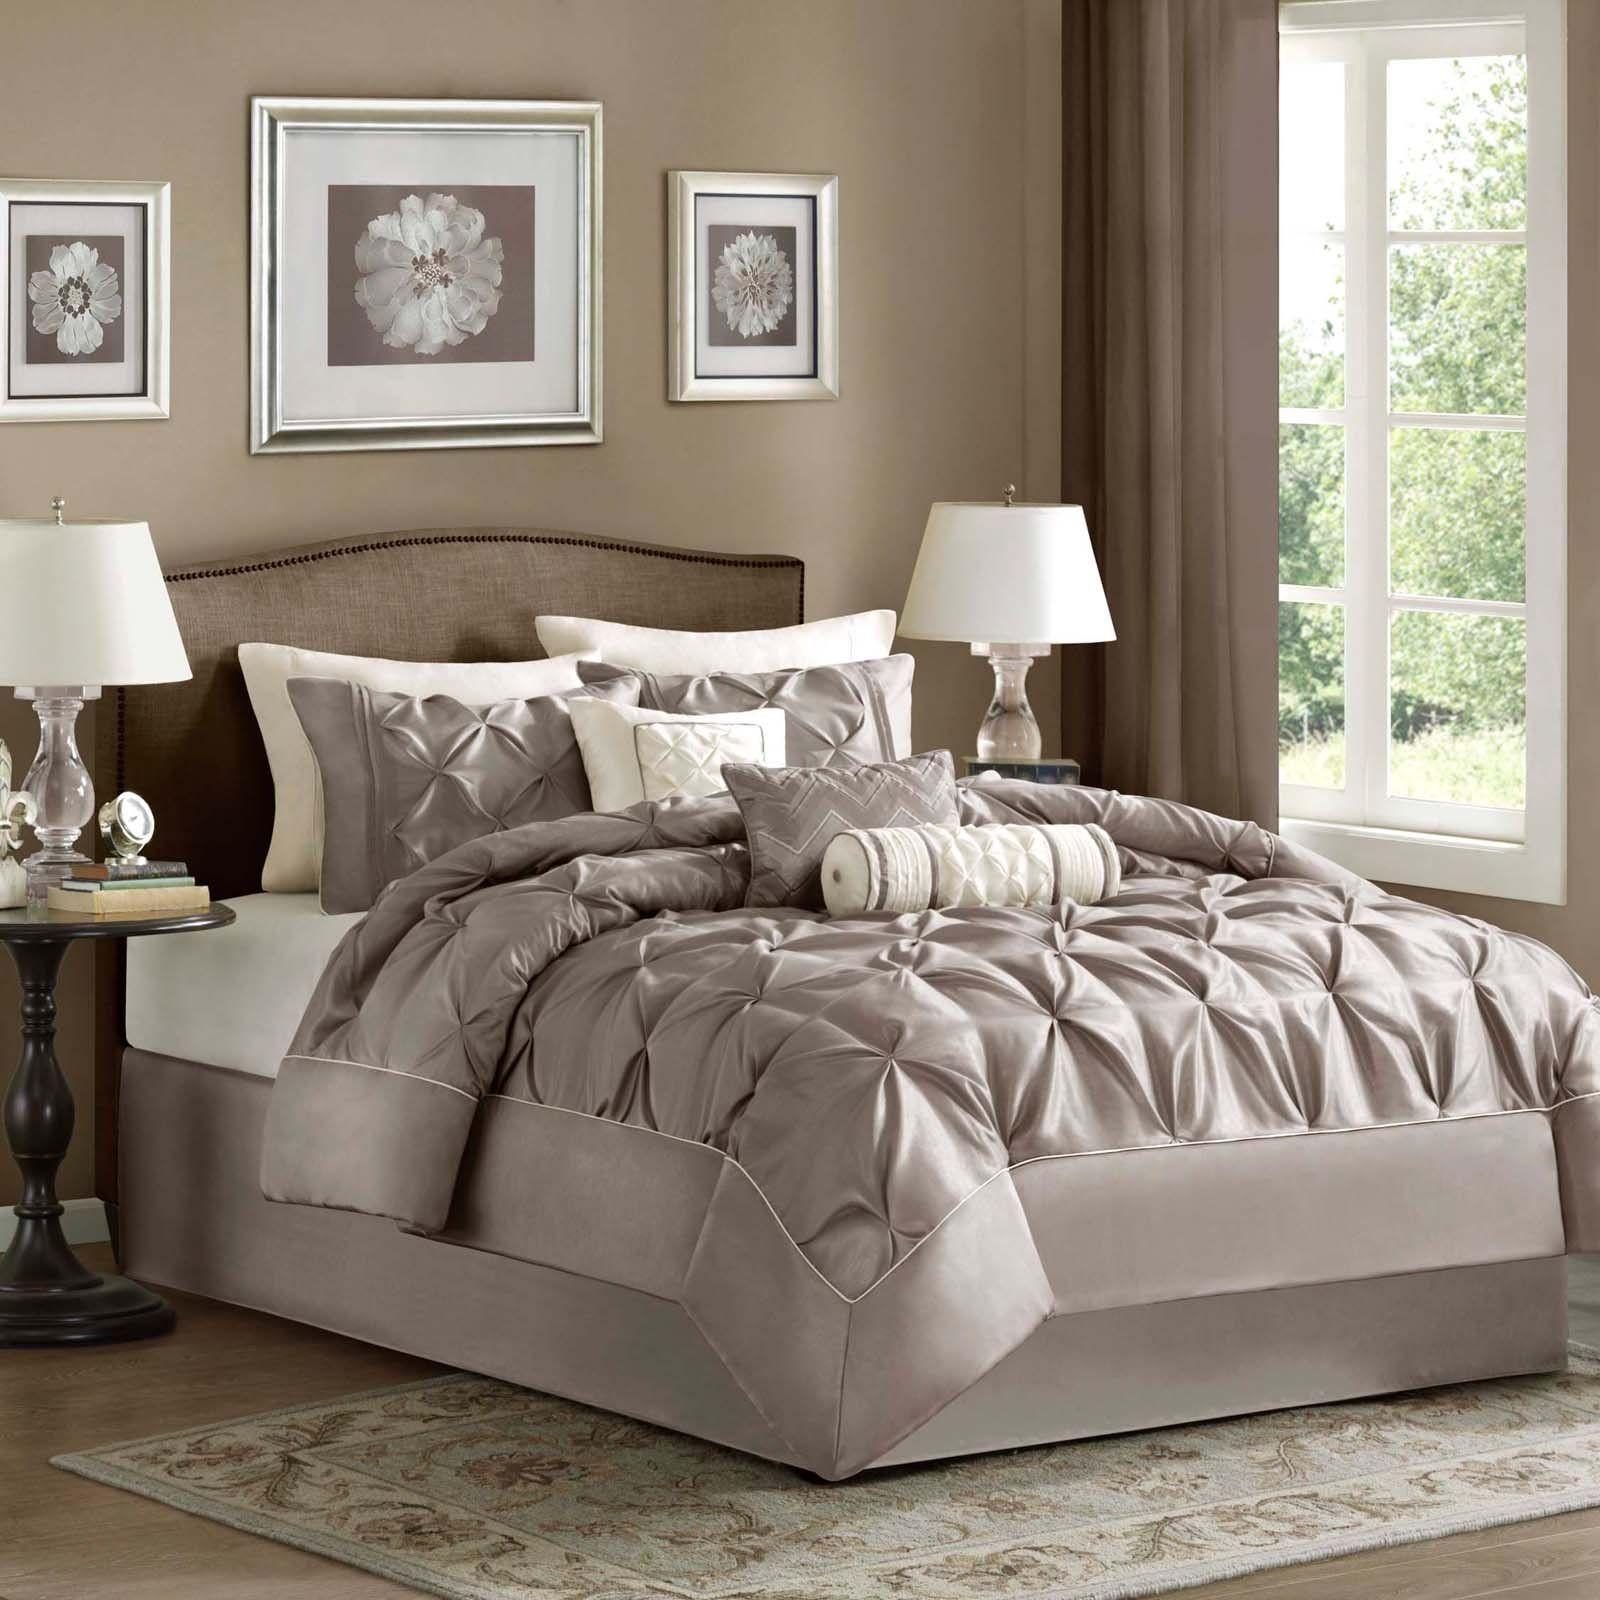 Twin bedding guest room - Madison Park Laurel Lafayette Piedmont 7 Piece Comforter Set 109 99 Guest Roomguest